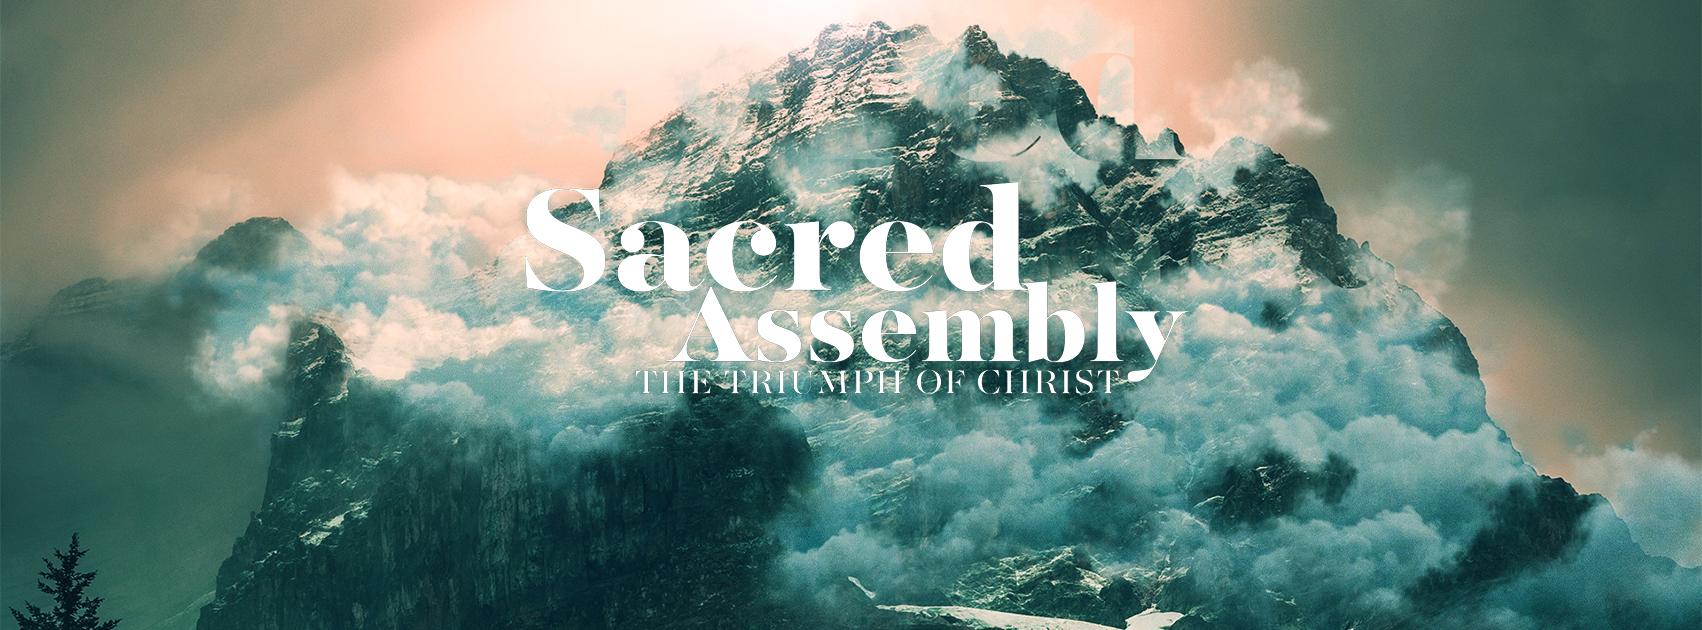 Sacred Assembly FB Cover Photo.jpg